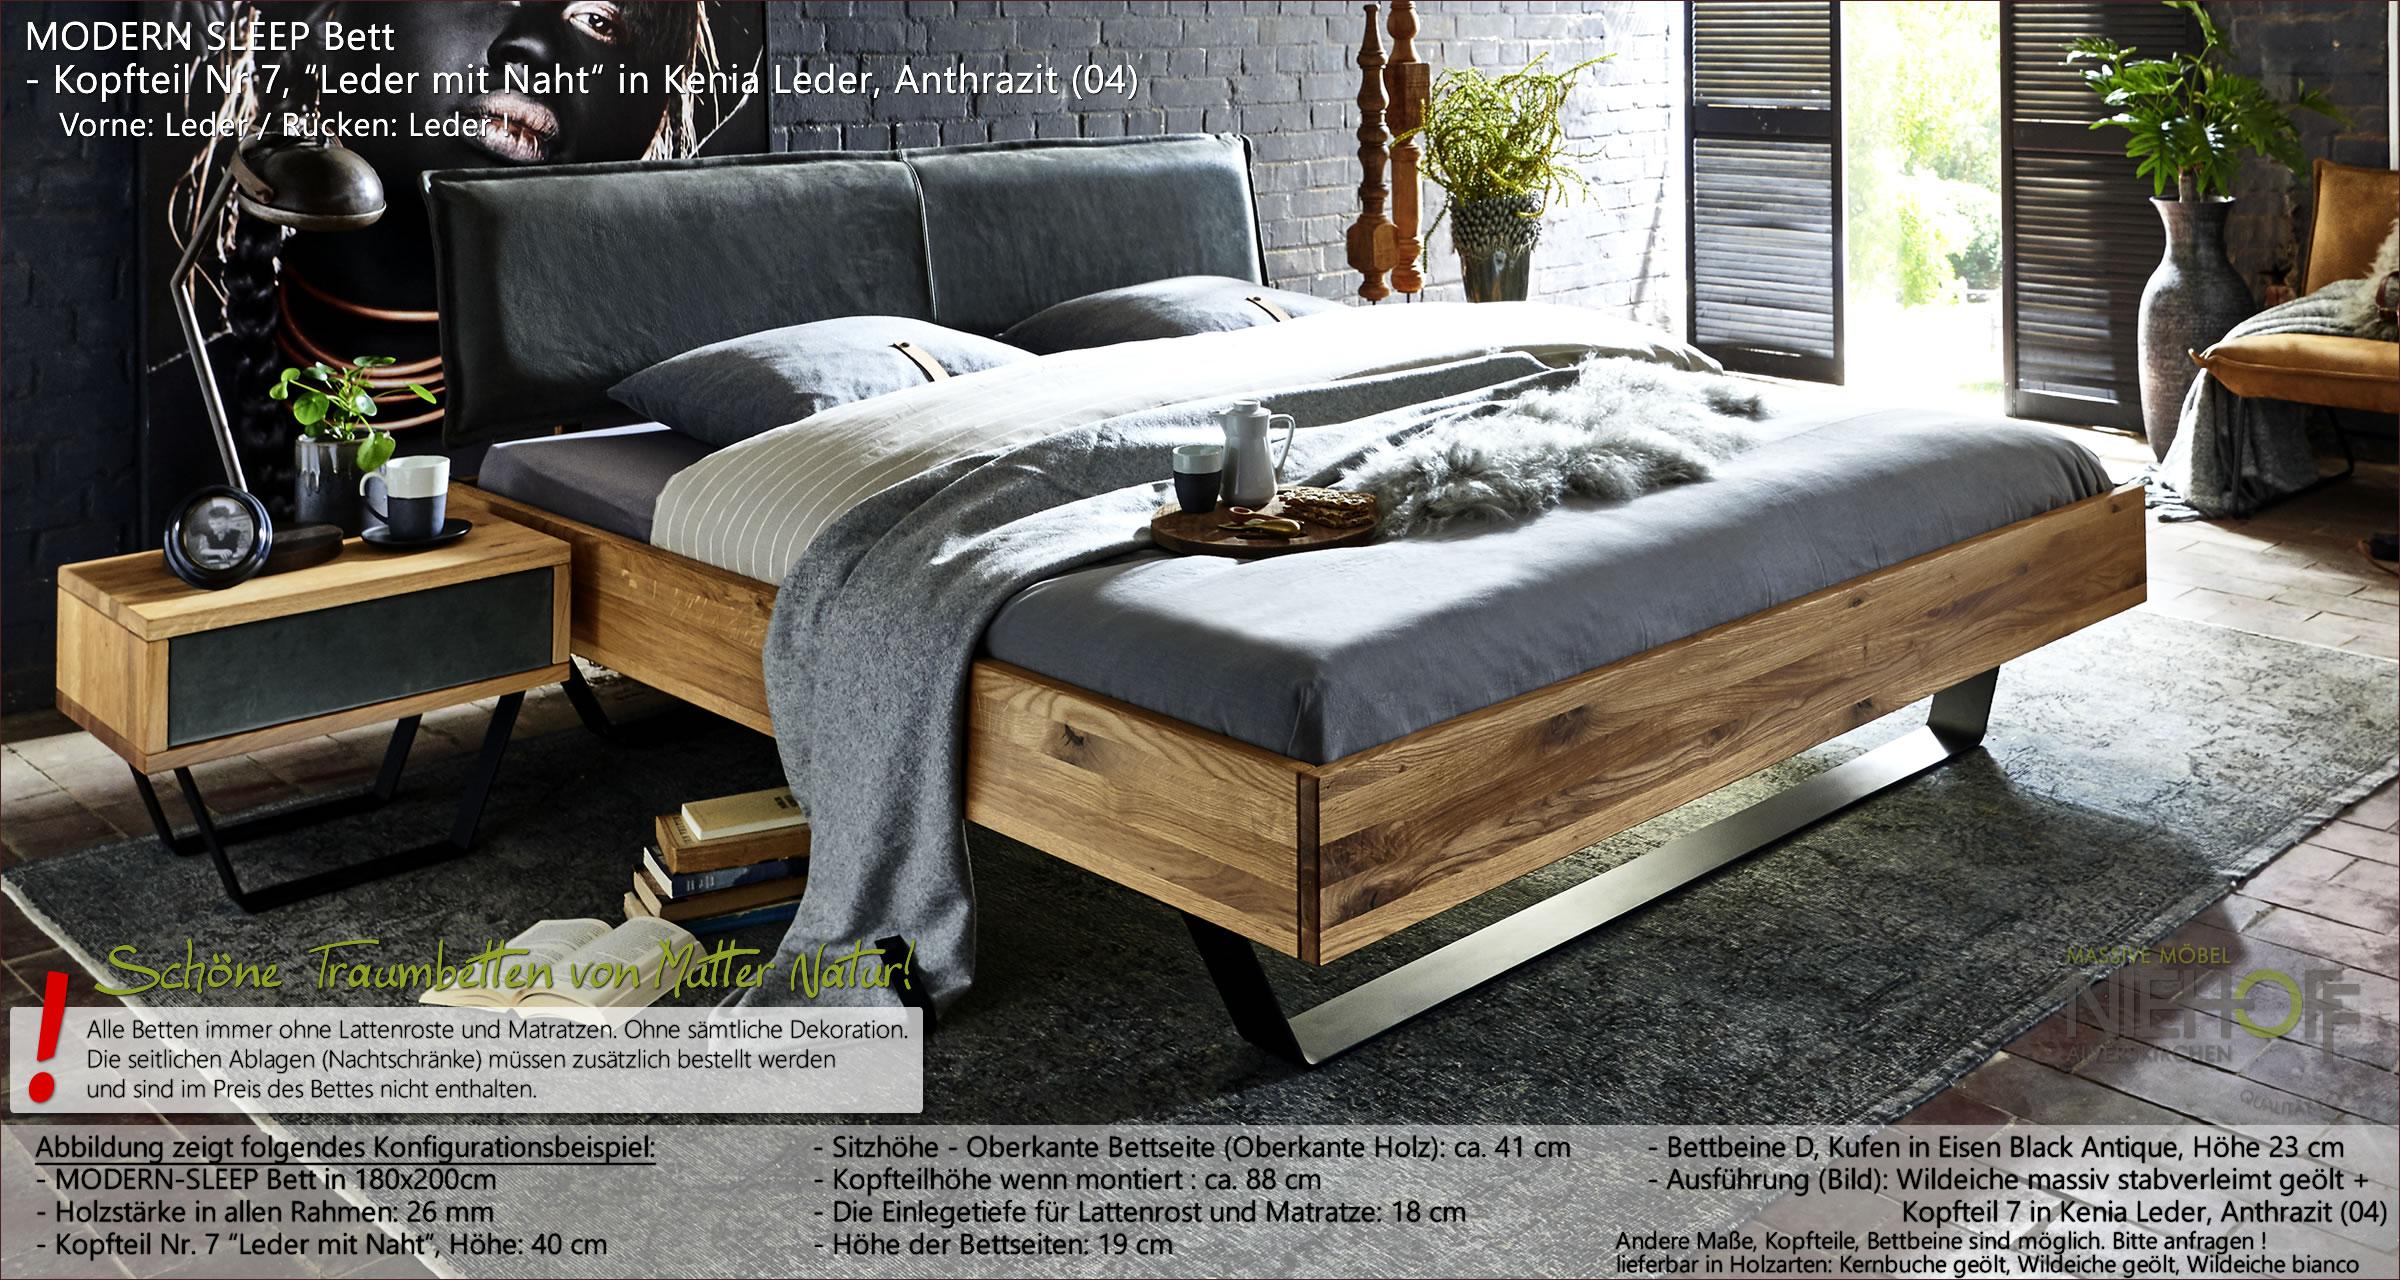 Full Size of Bett Rückwand Holz Modernes Massivholzbett Modern Sleep Mit Kopfteil Aus Kenia Leder Breite Massivholz Esstisch Selber Bauen 180x200 Schöne Betten Wohnzimmer Bett Rückwand Holz